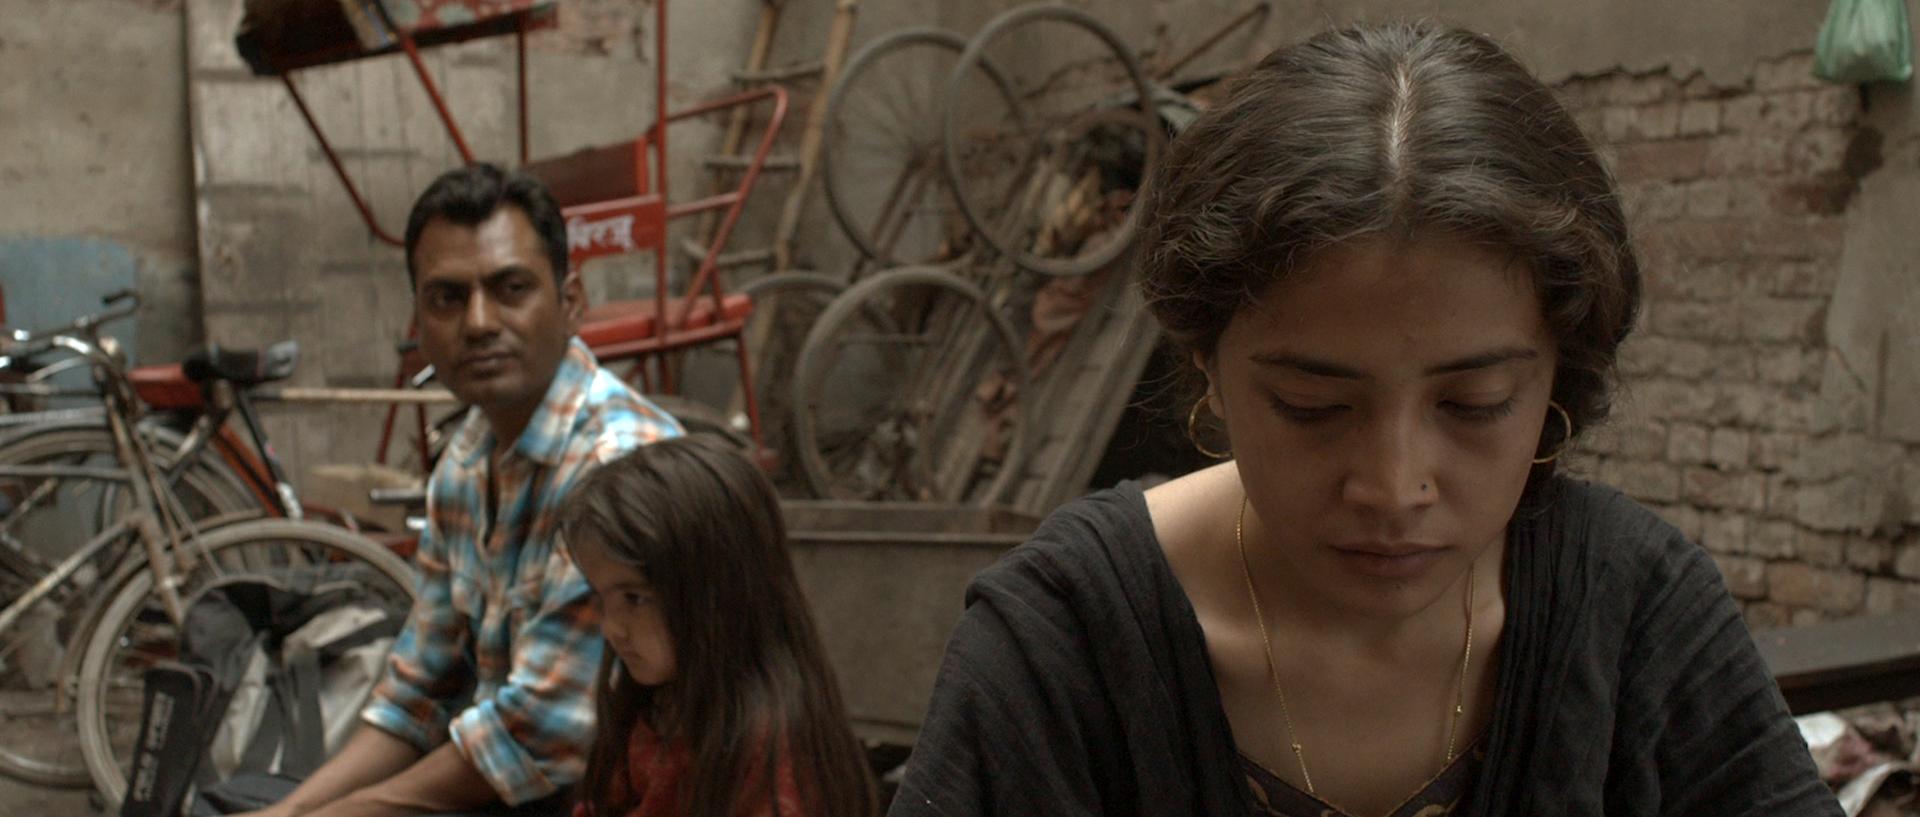 Immagine tratta dal film Liar's Dice, di Geethu Mohandas